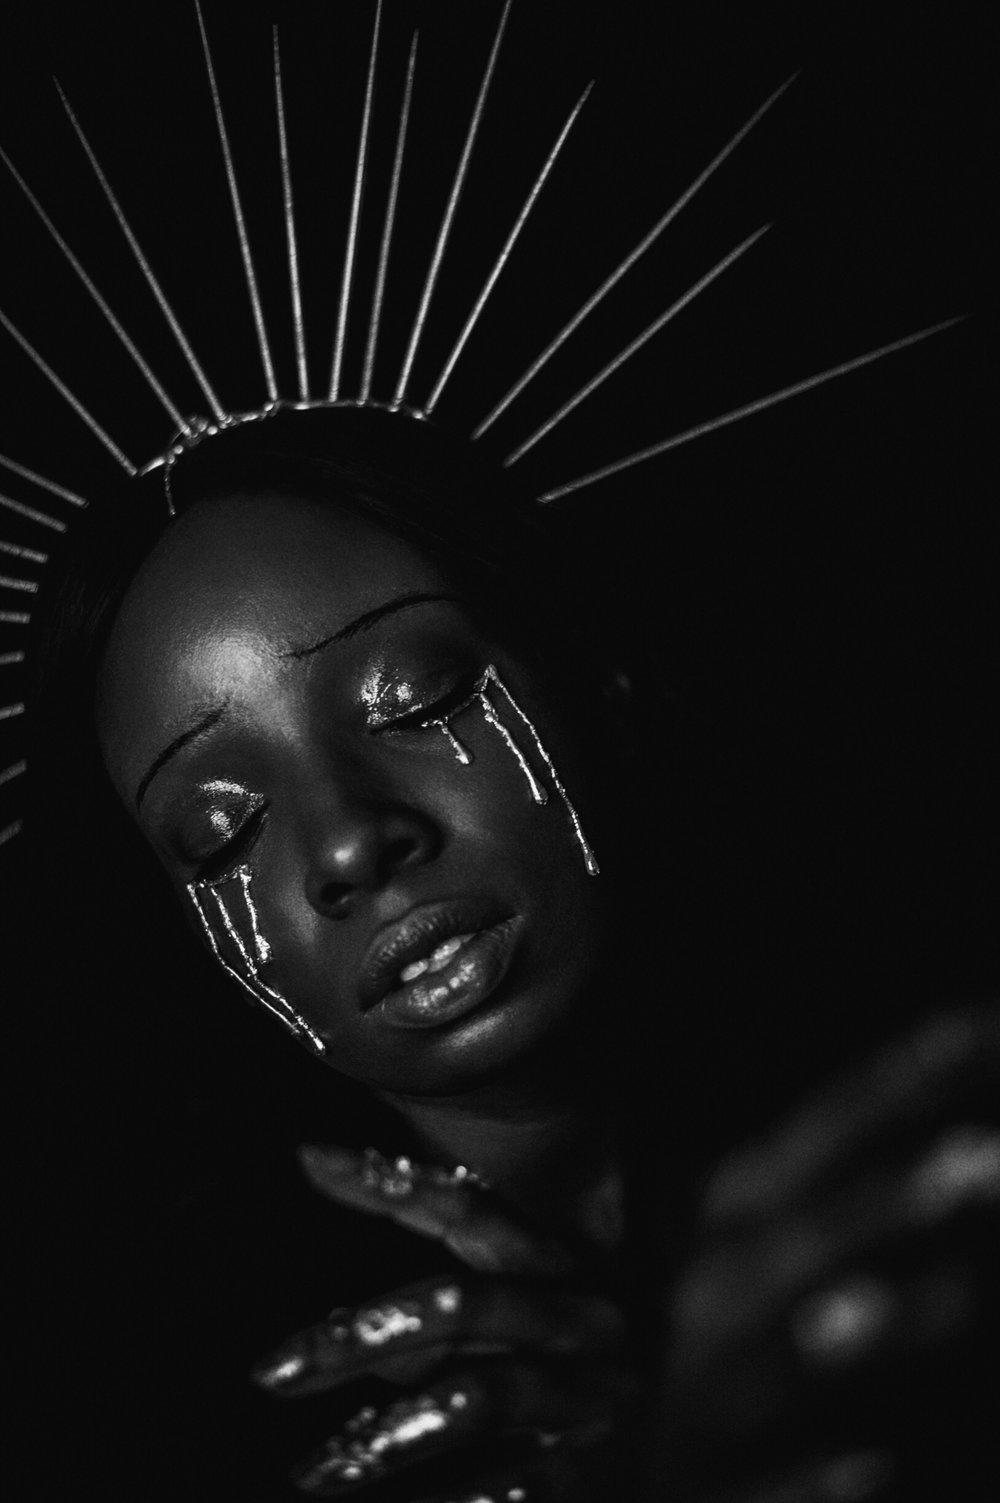 TheGlossier-TashaJames-Halloween-2018-Crying-Saint-Gold-Heavenly-Bodies16.JPG